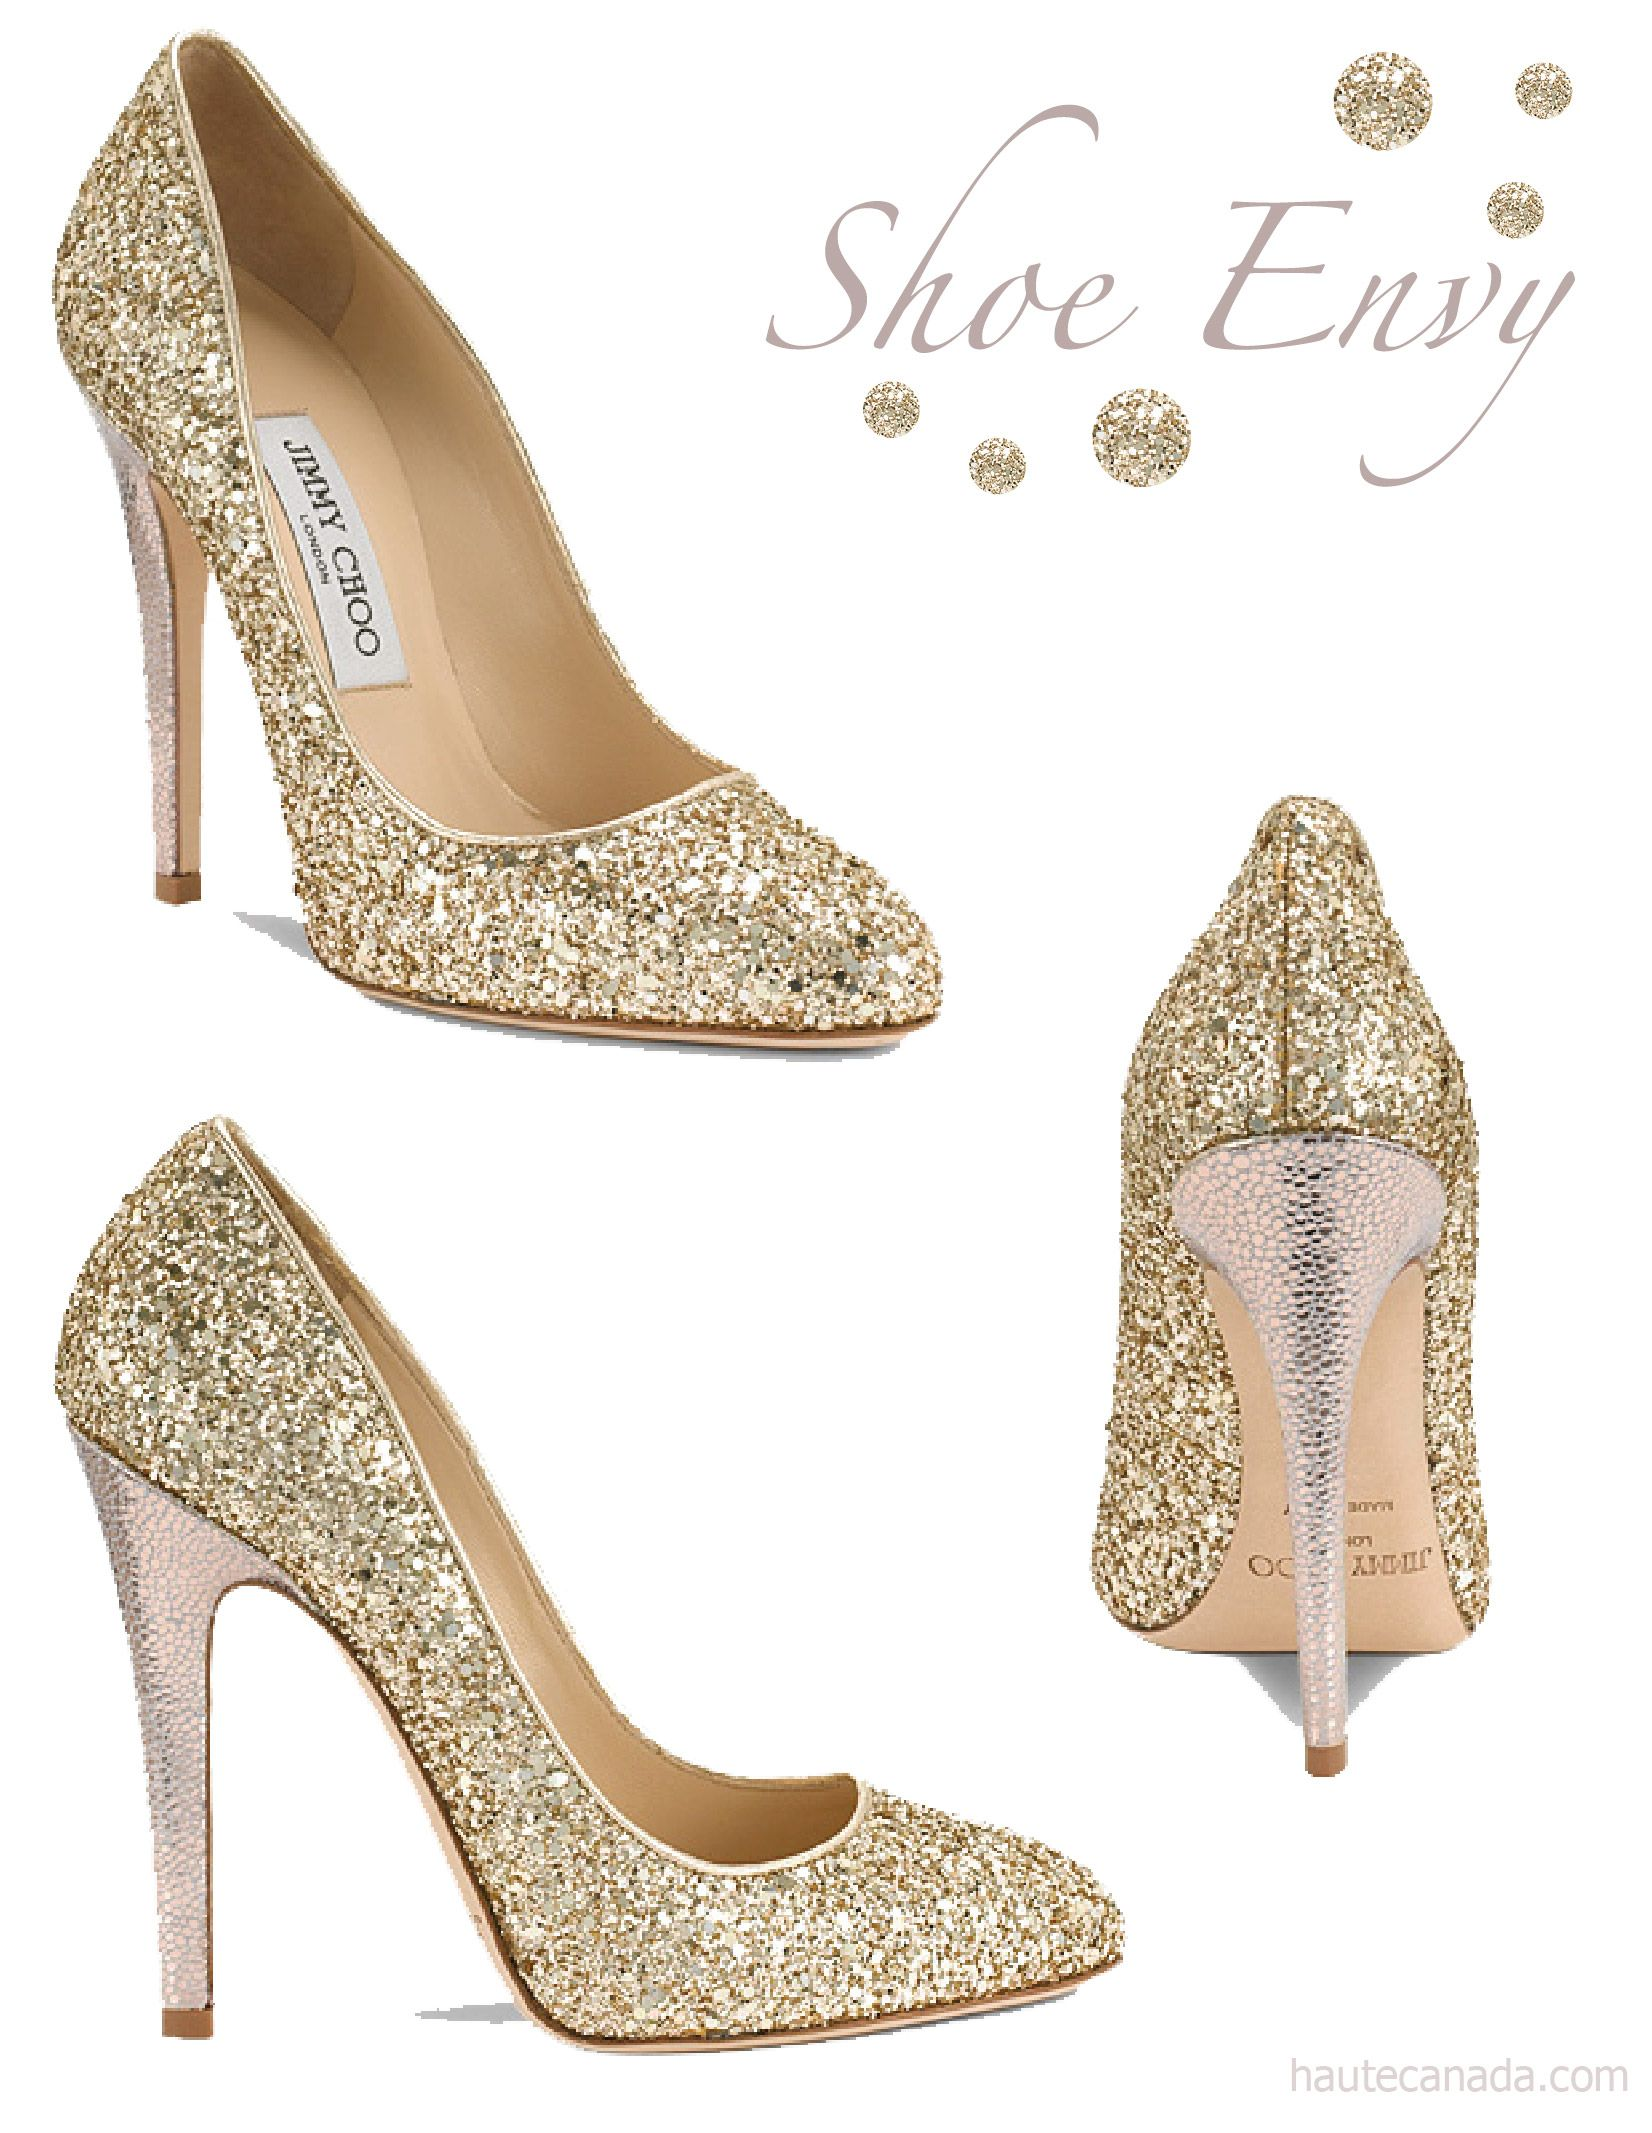 Shoe Envy: Jimmy Choo – Victoria, Gold Glitter Pumps | Haute by ...